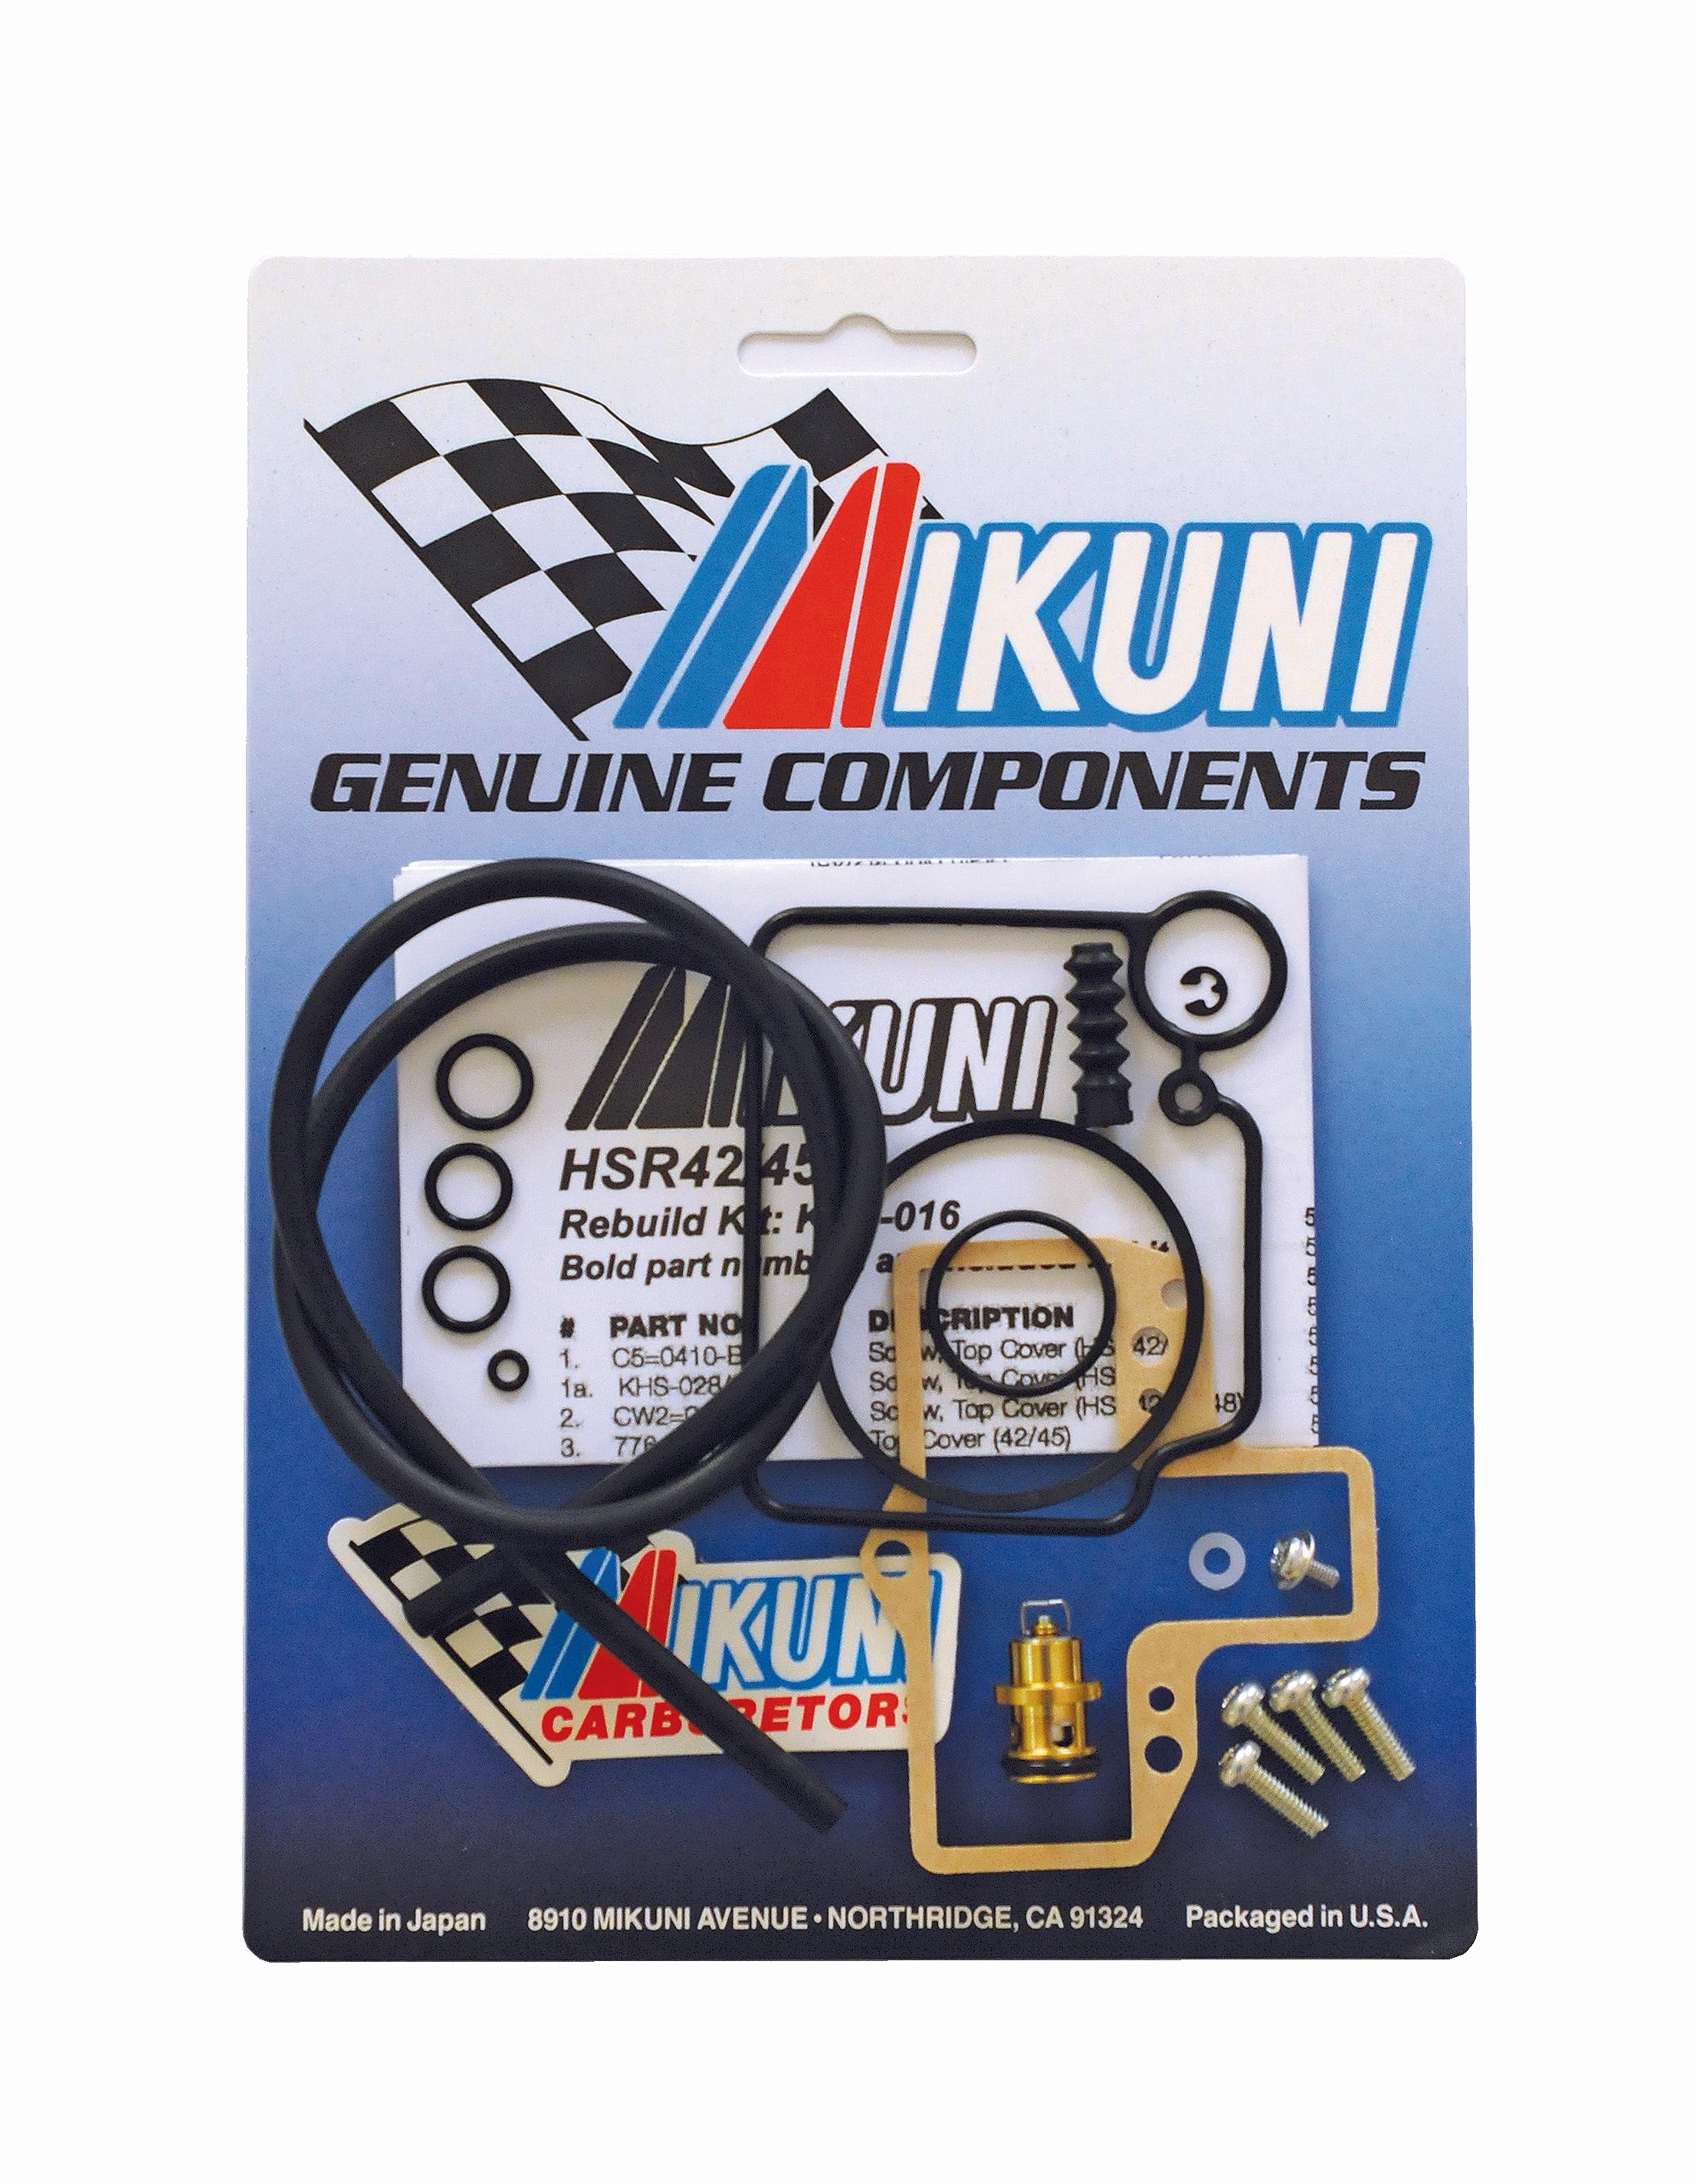 Mikuni Power - Mikuni Genuine Carburetor & Fuel Pump Rebuild